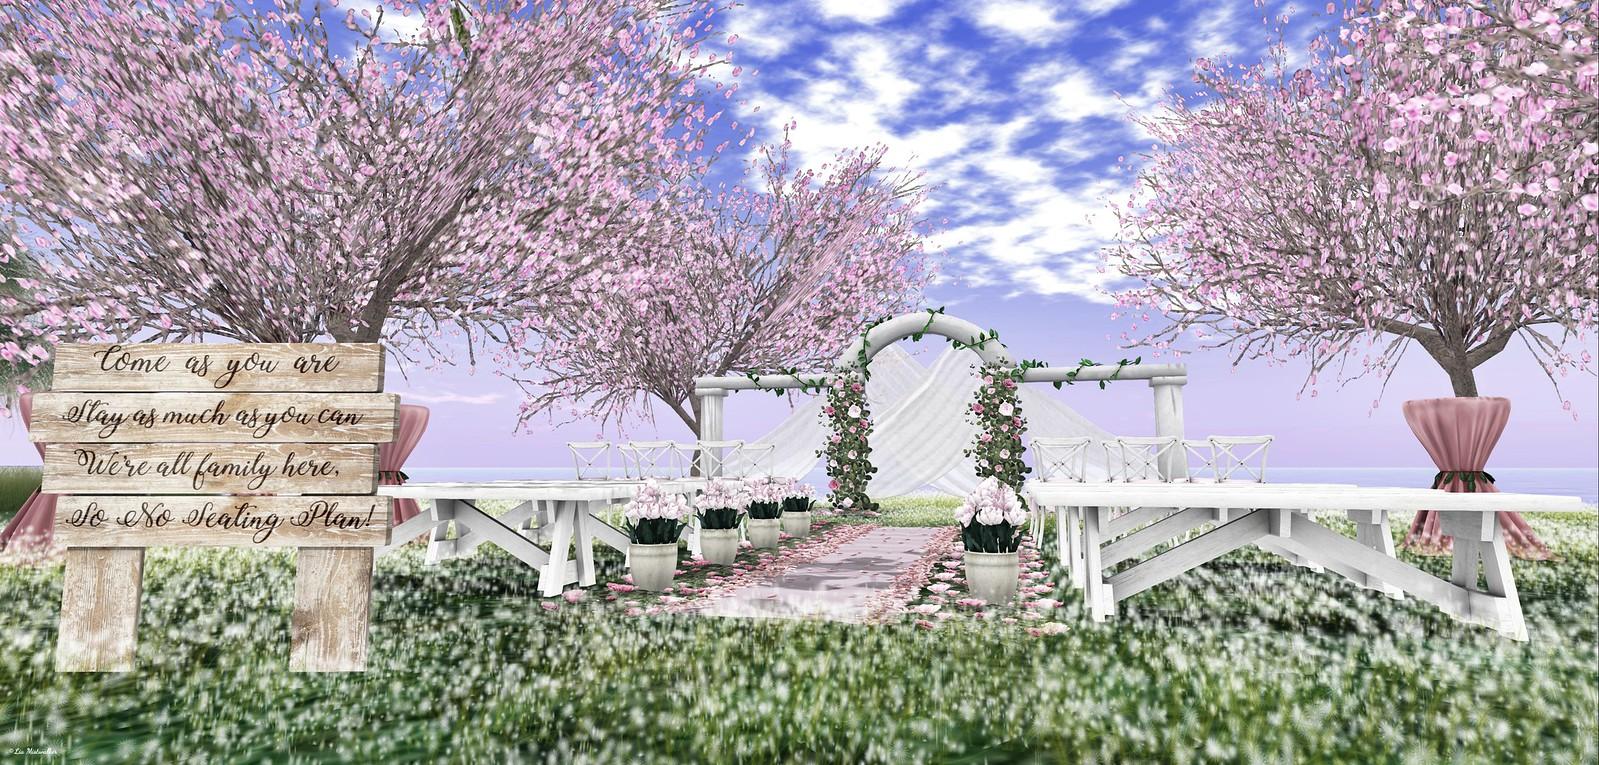 Home & Garden Therapy # 594